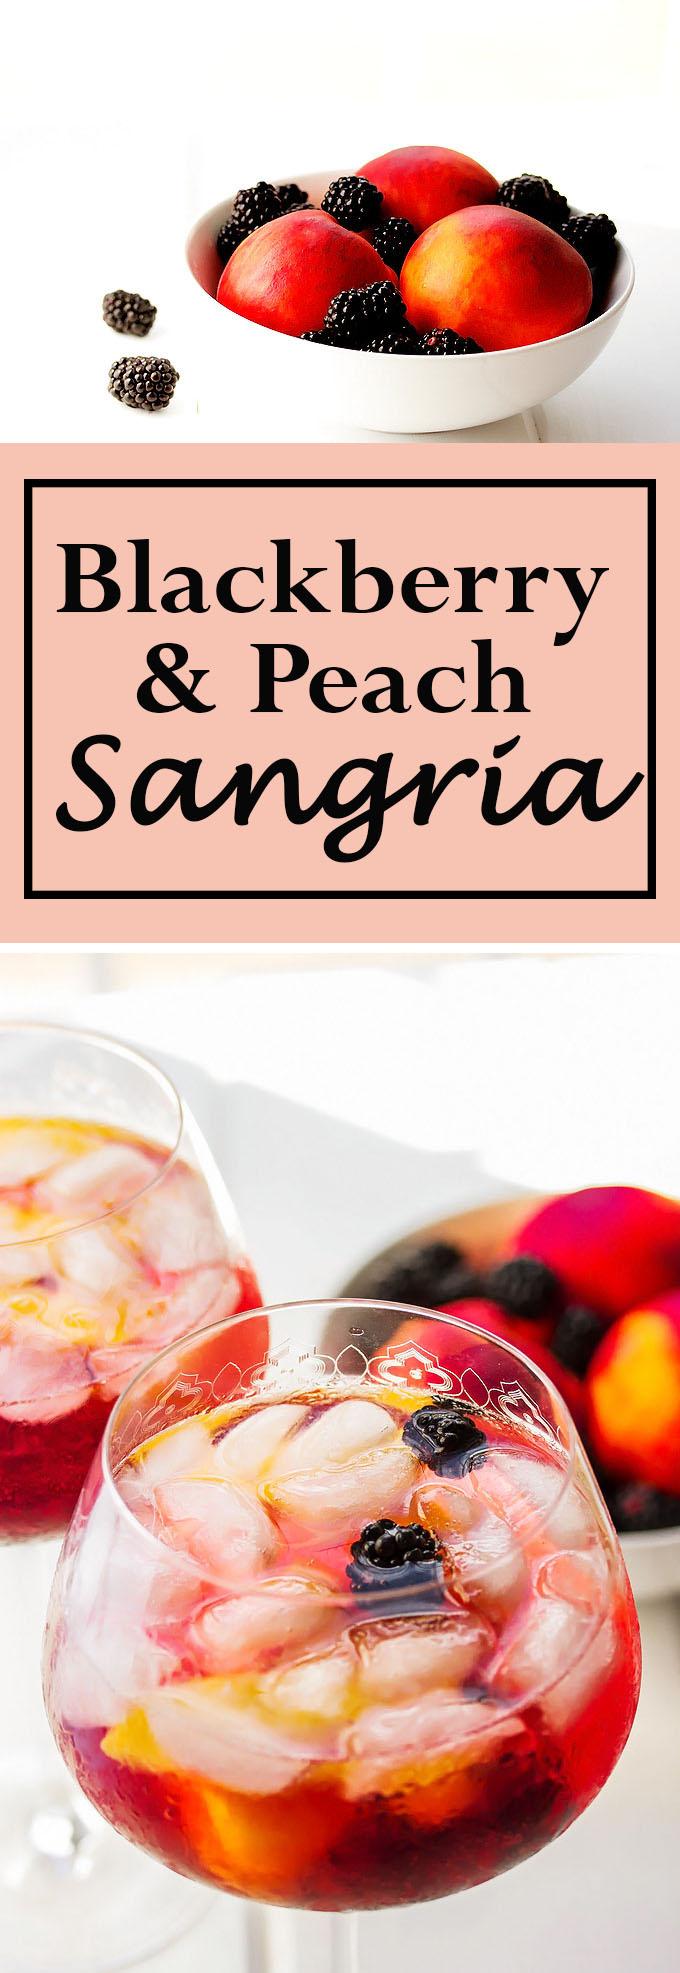 Blackberry and Peach Sangria